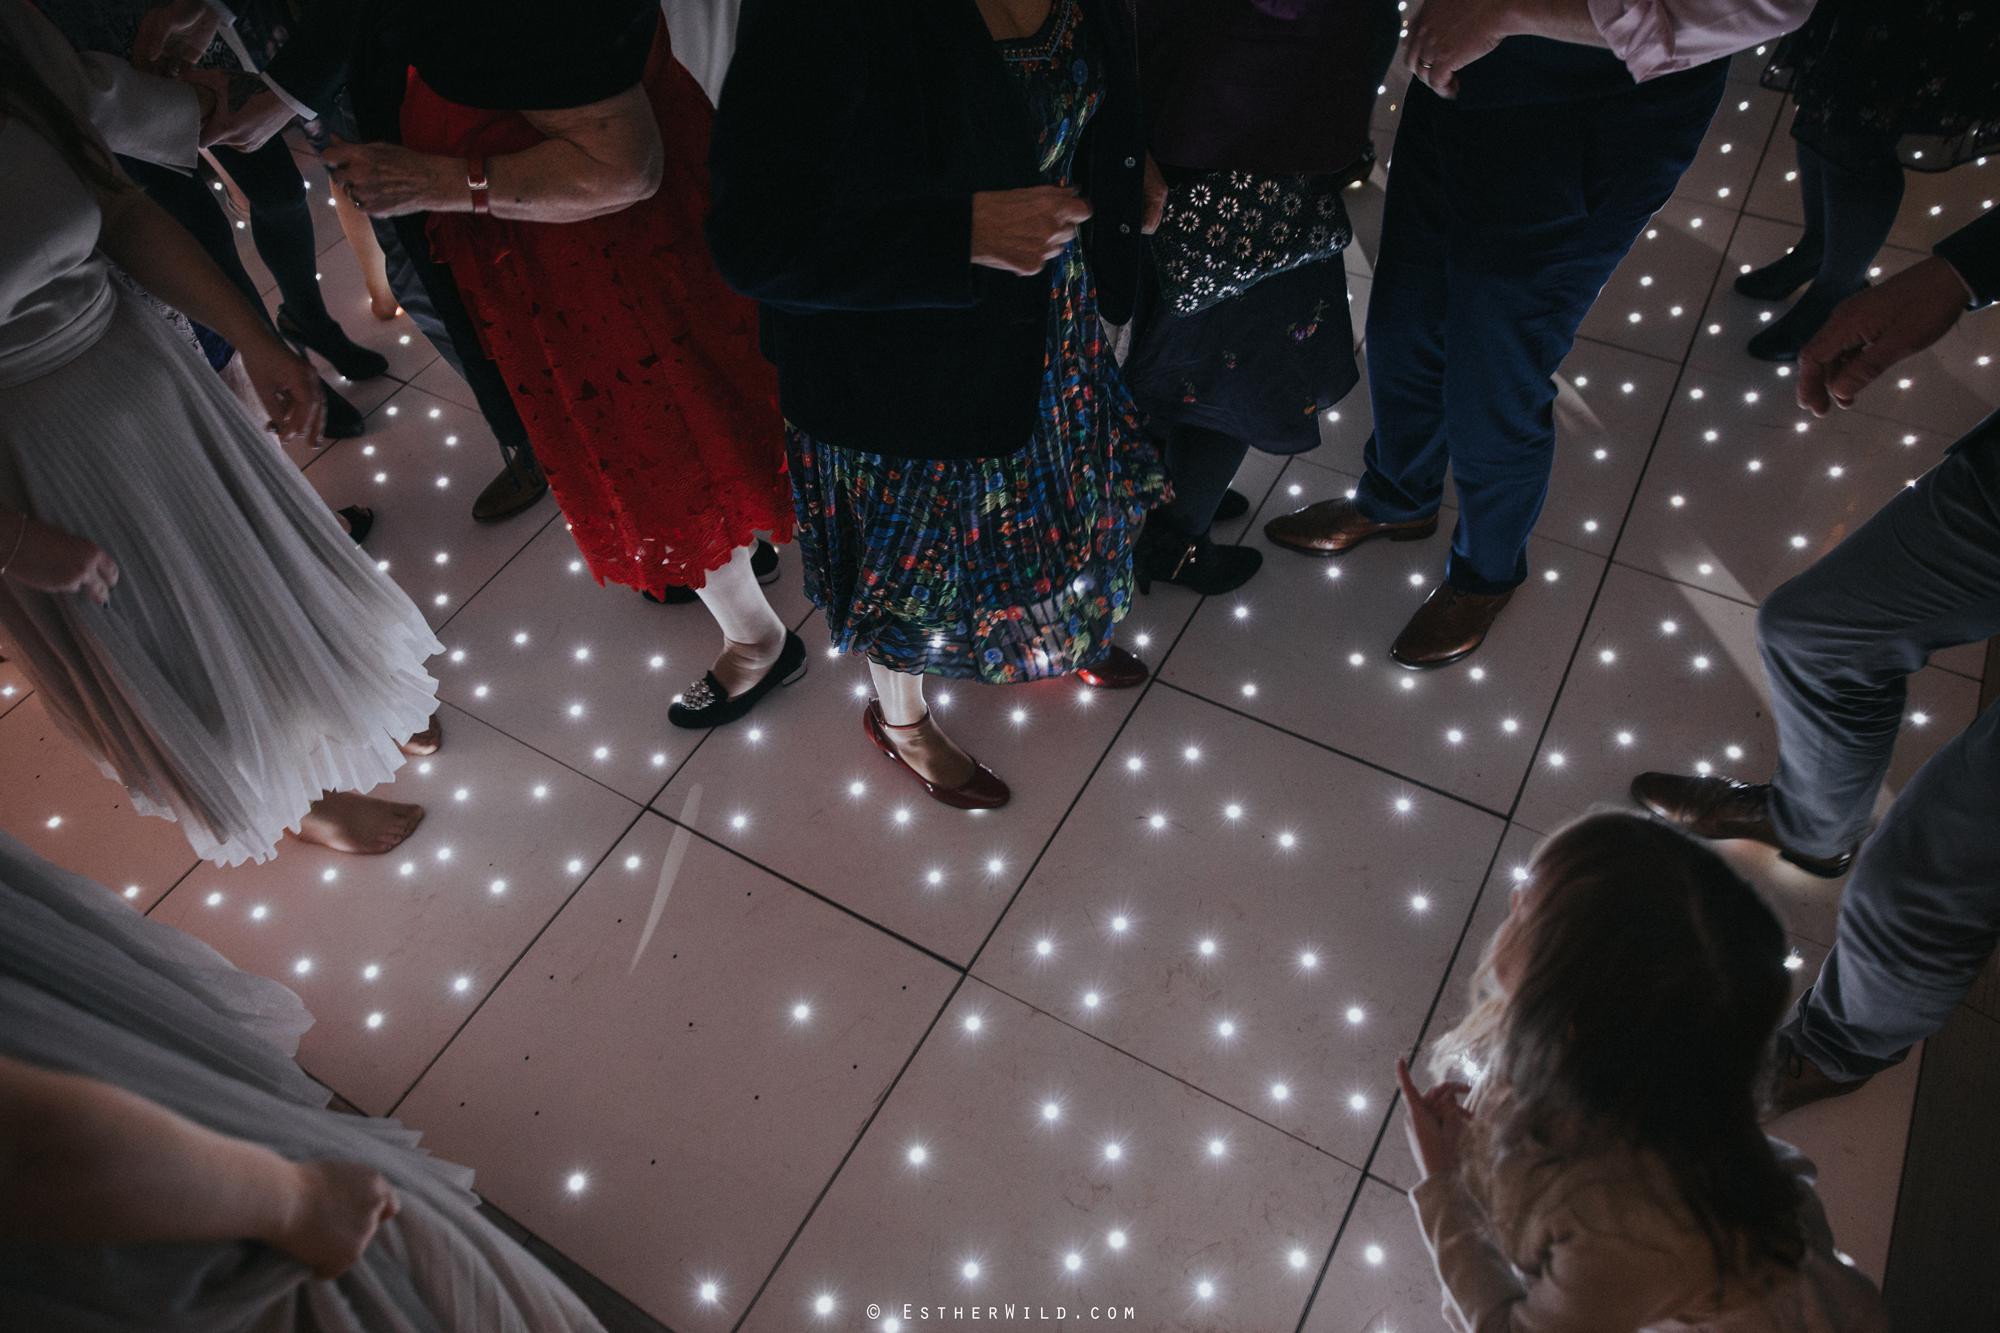 Elms_Barn_Weddings_Suffolk_Photographer_Copyright_Esther_Wild_IMG_3605.jpg